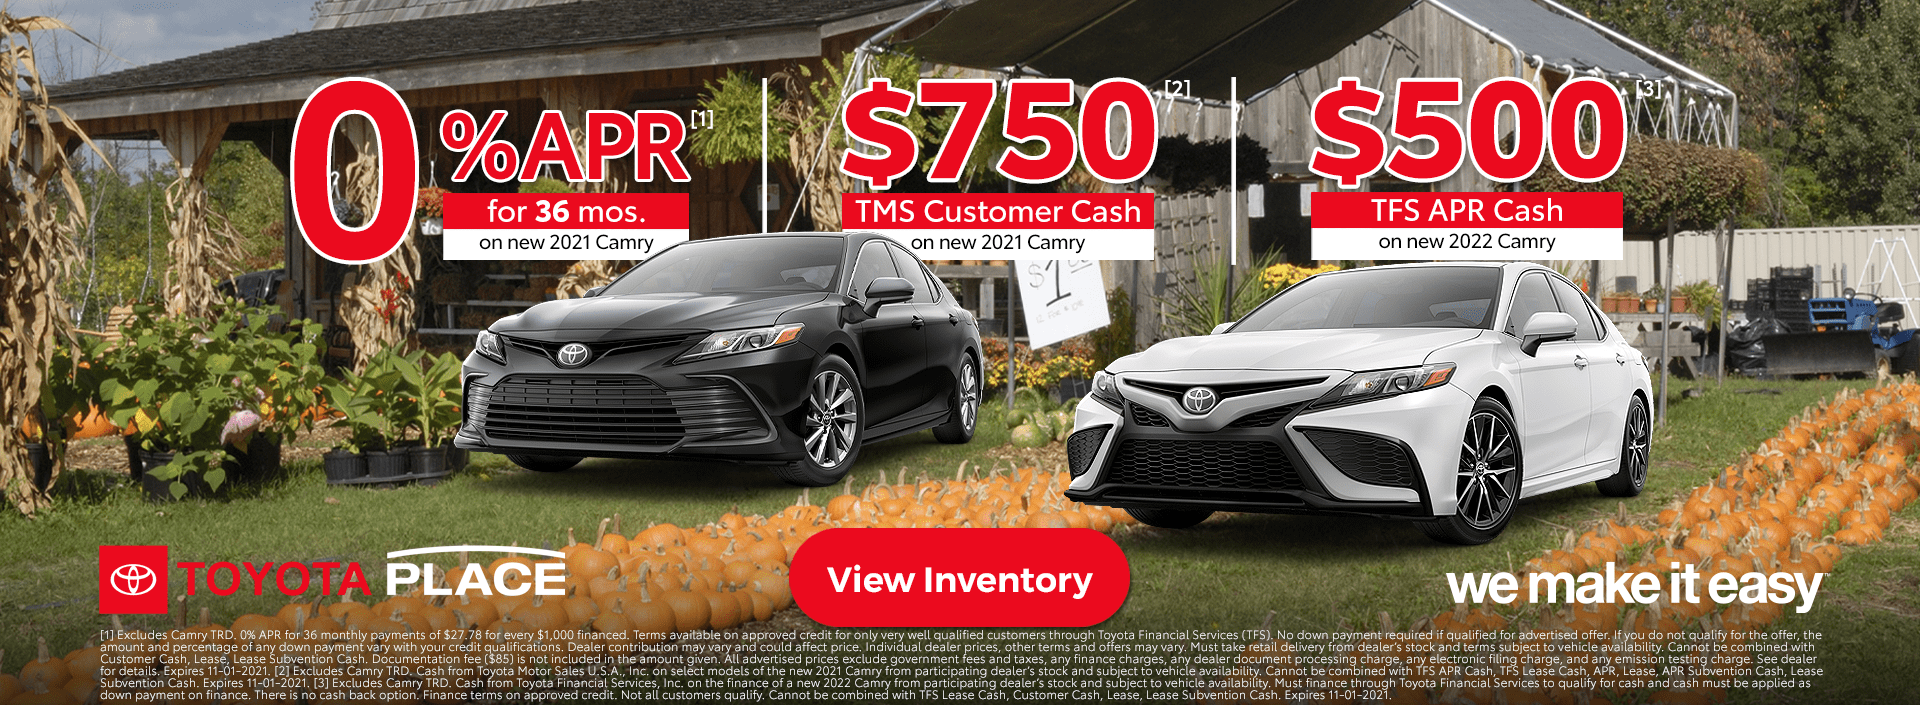 Toyota Camry Specials Orange County